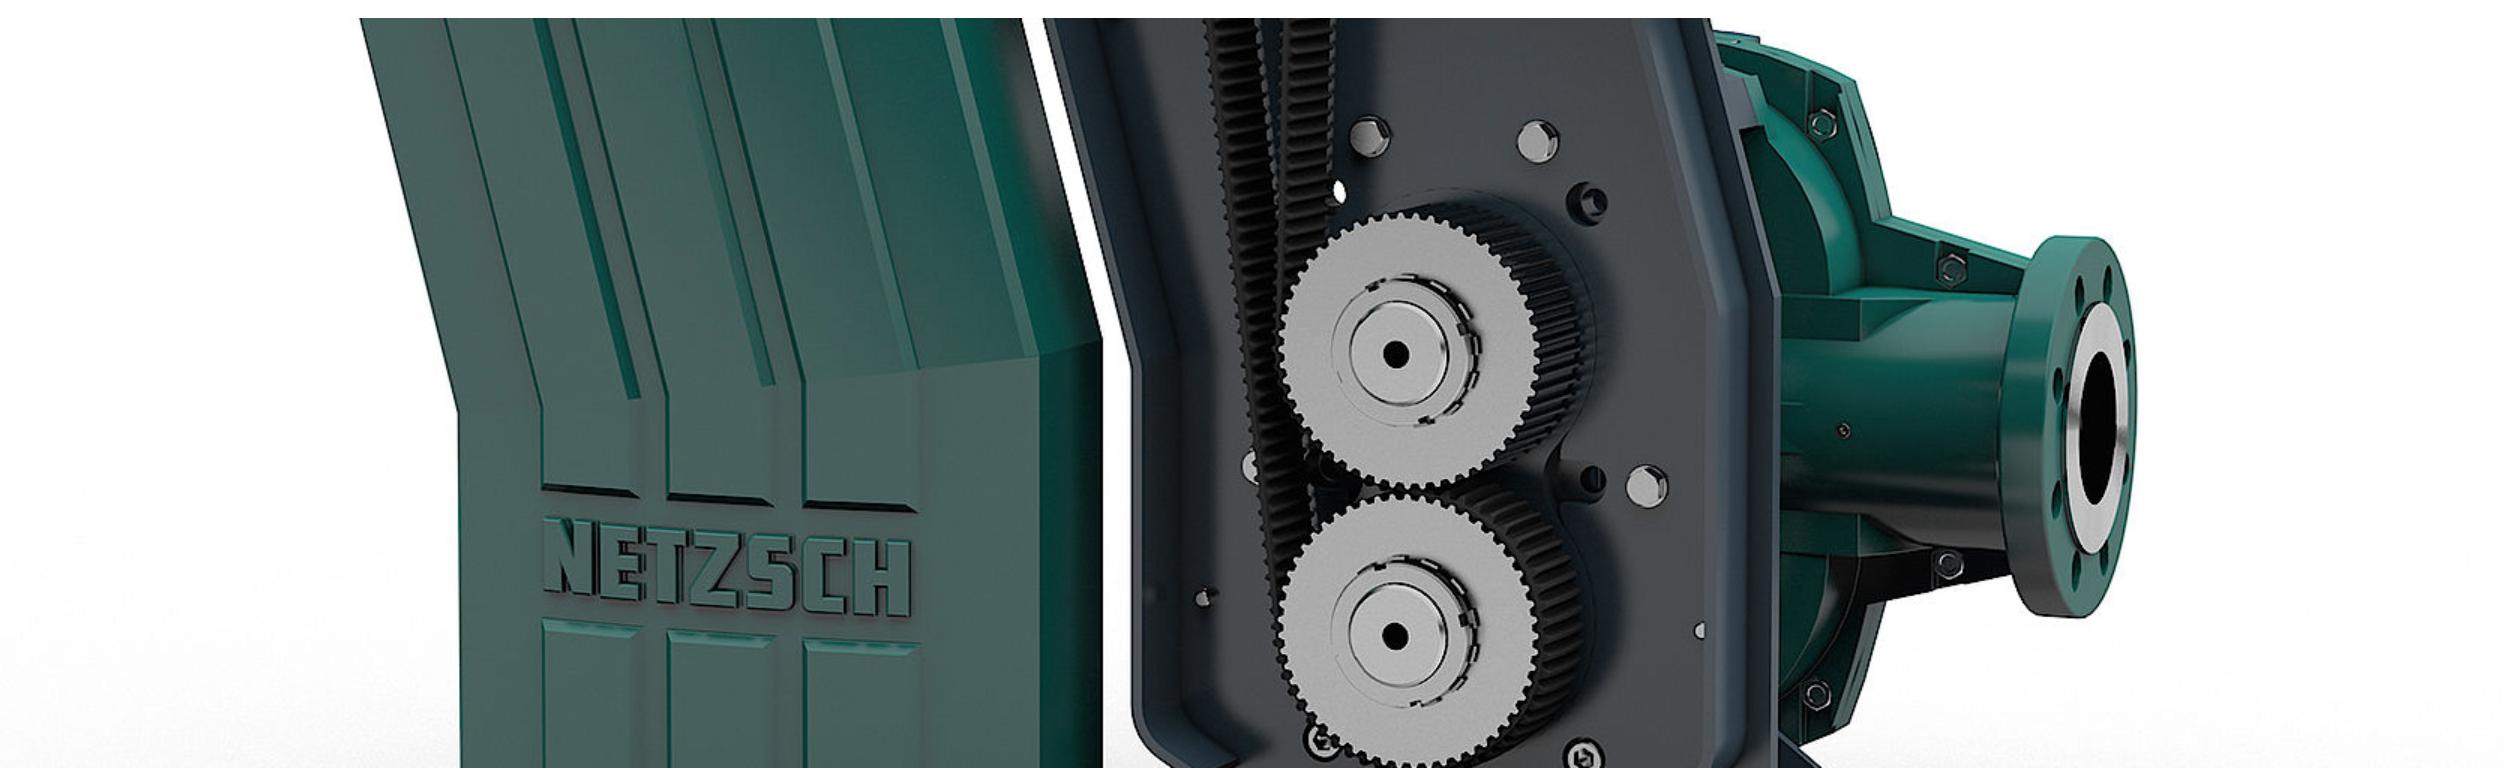 TORNADO® Industrial Rotary Lobe Pumps by NETZSCH